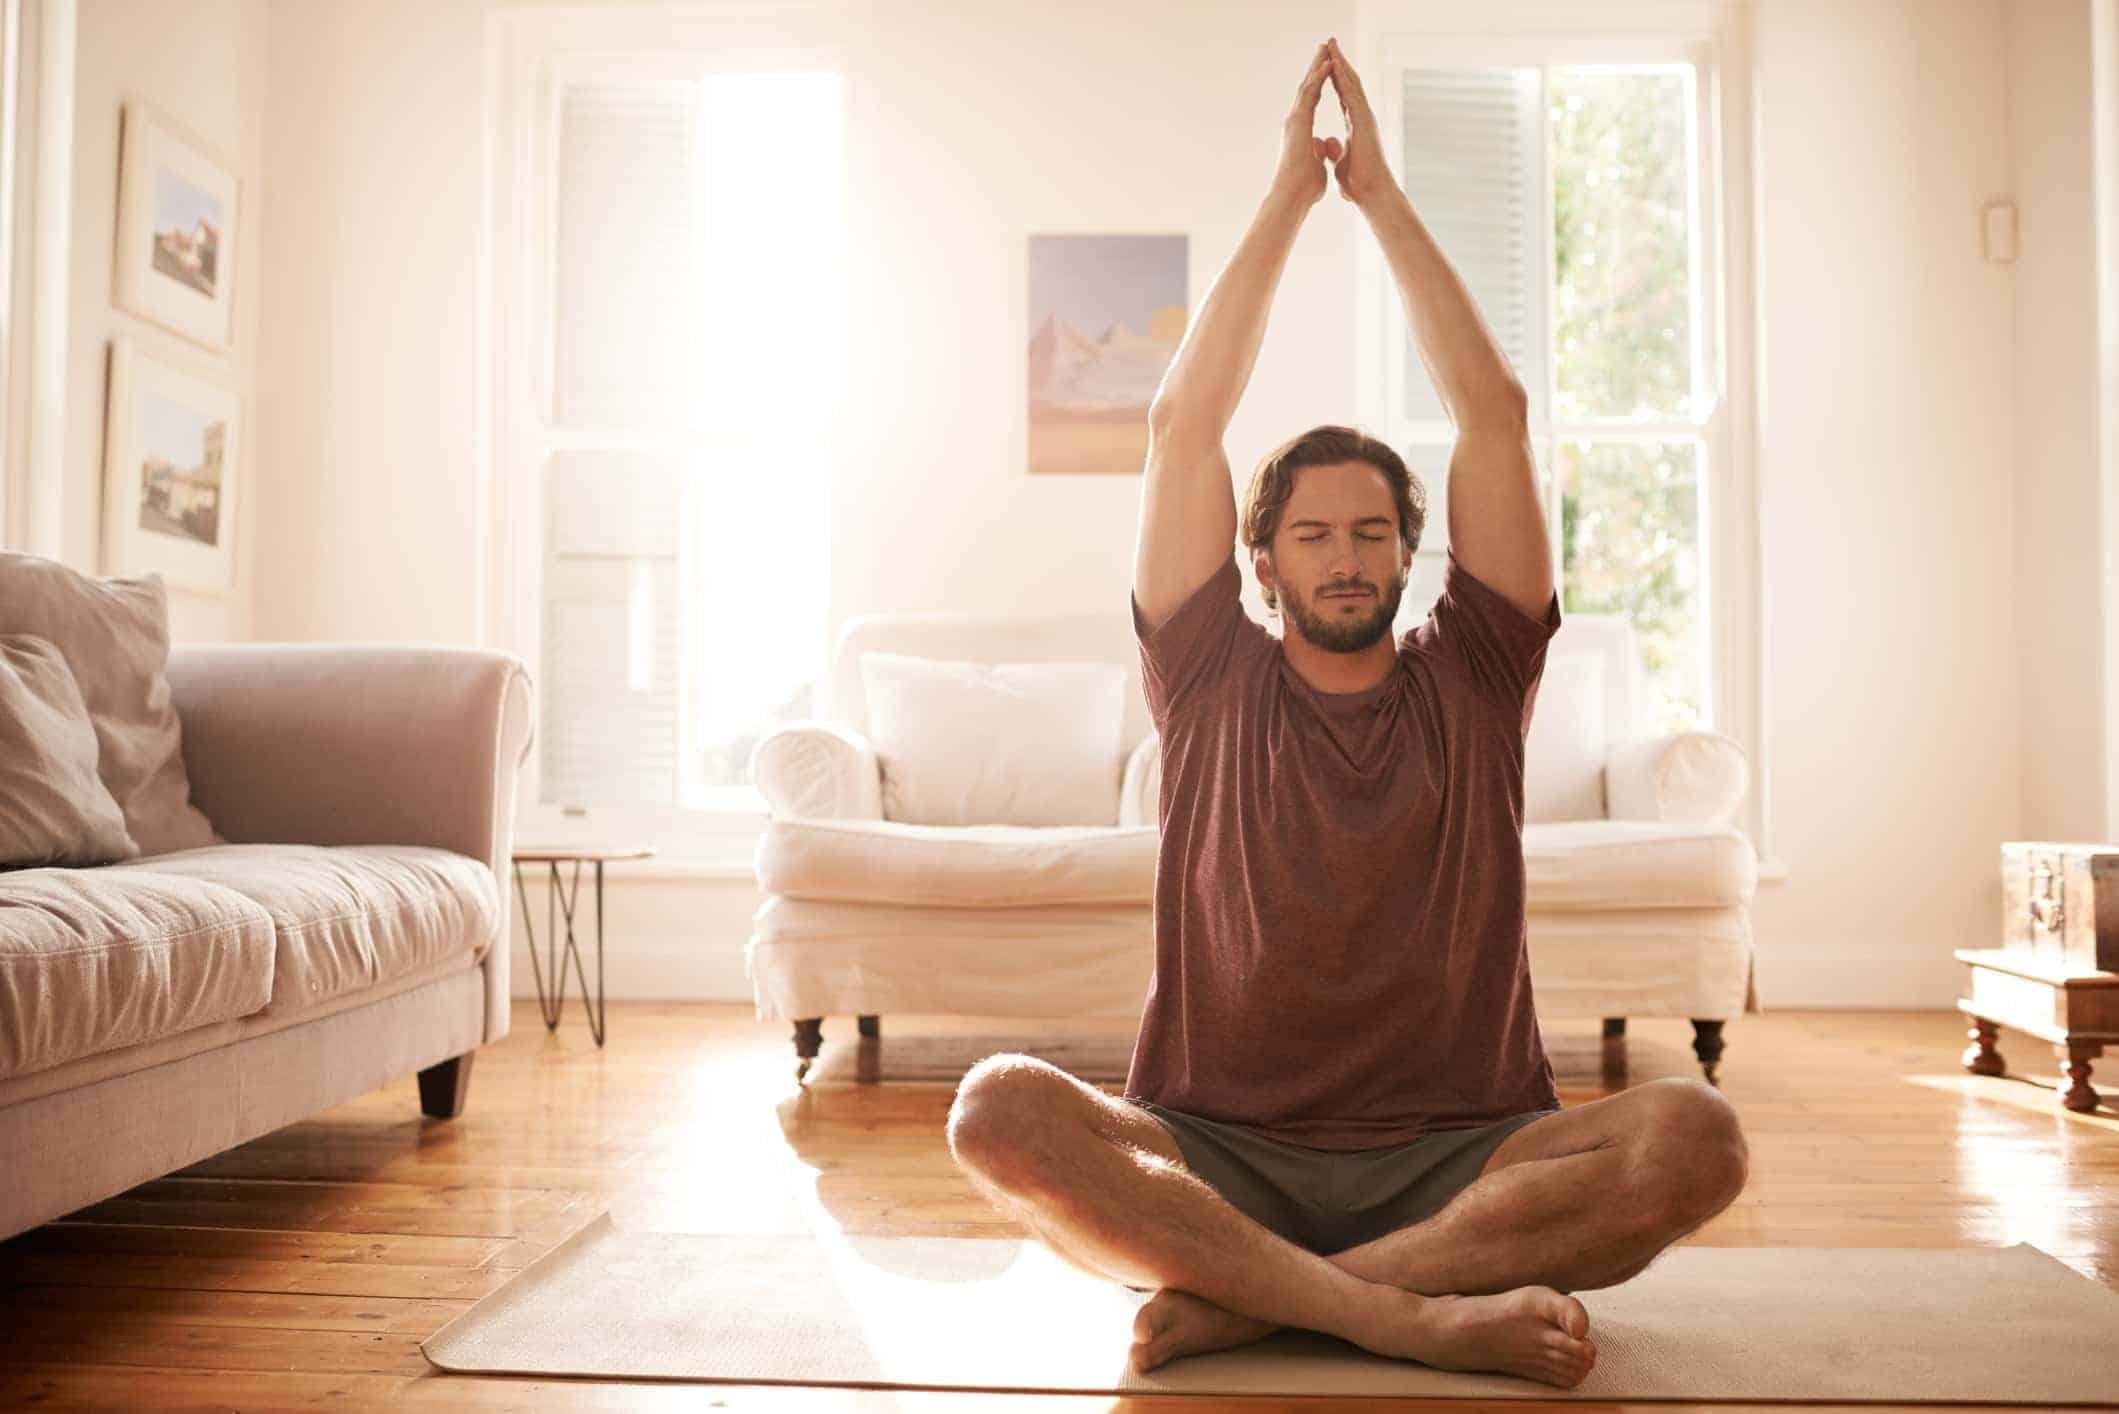 Yoga is the perfect mindfulness meditation.